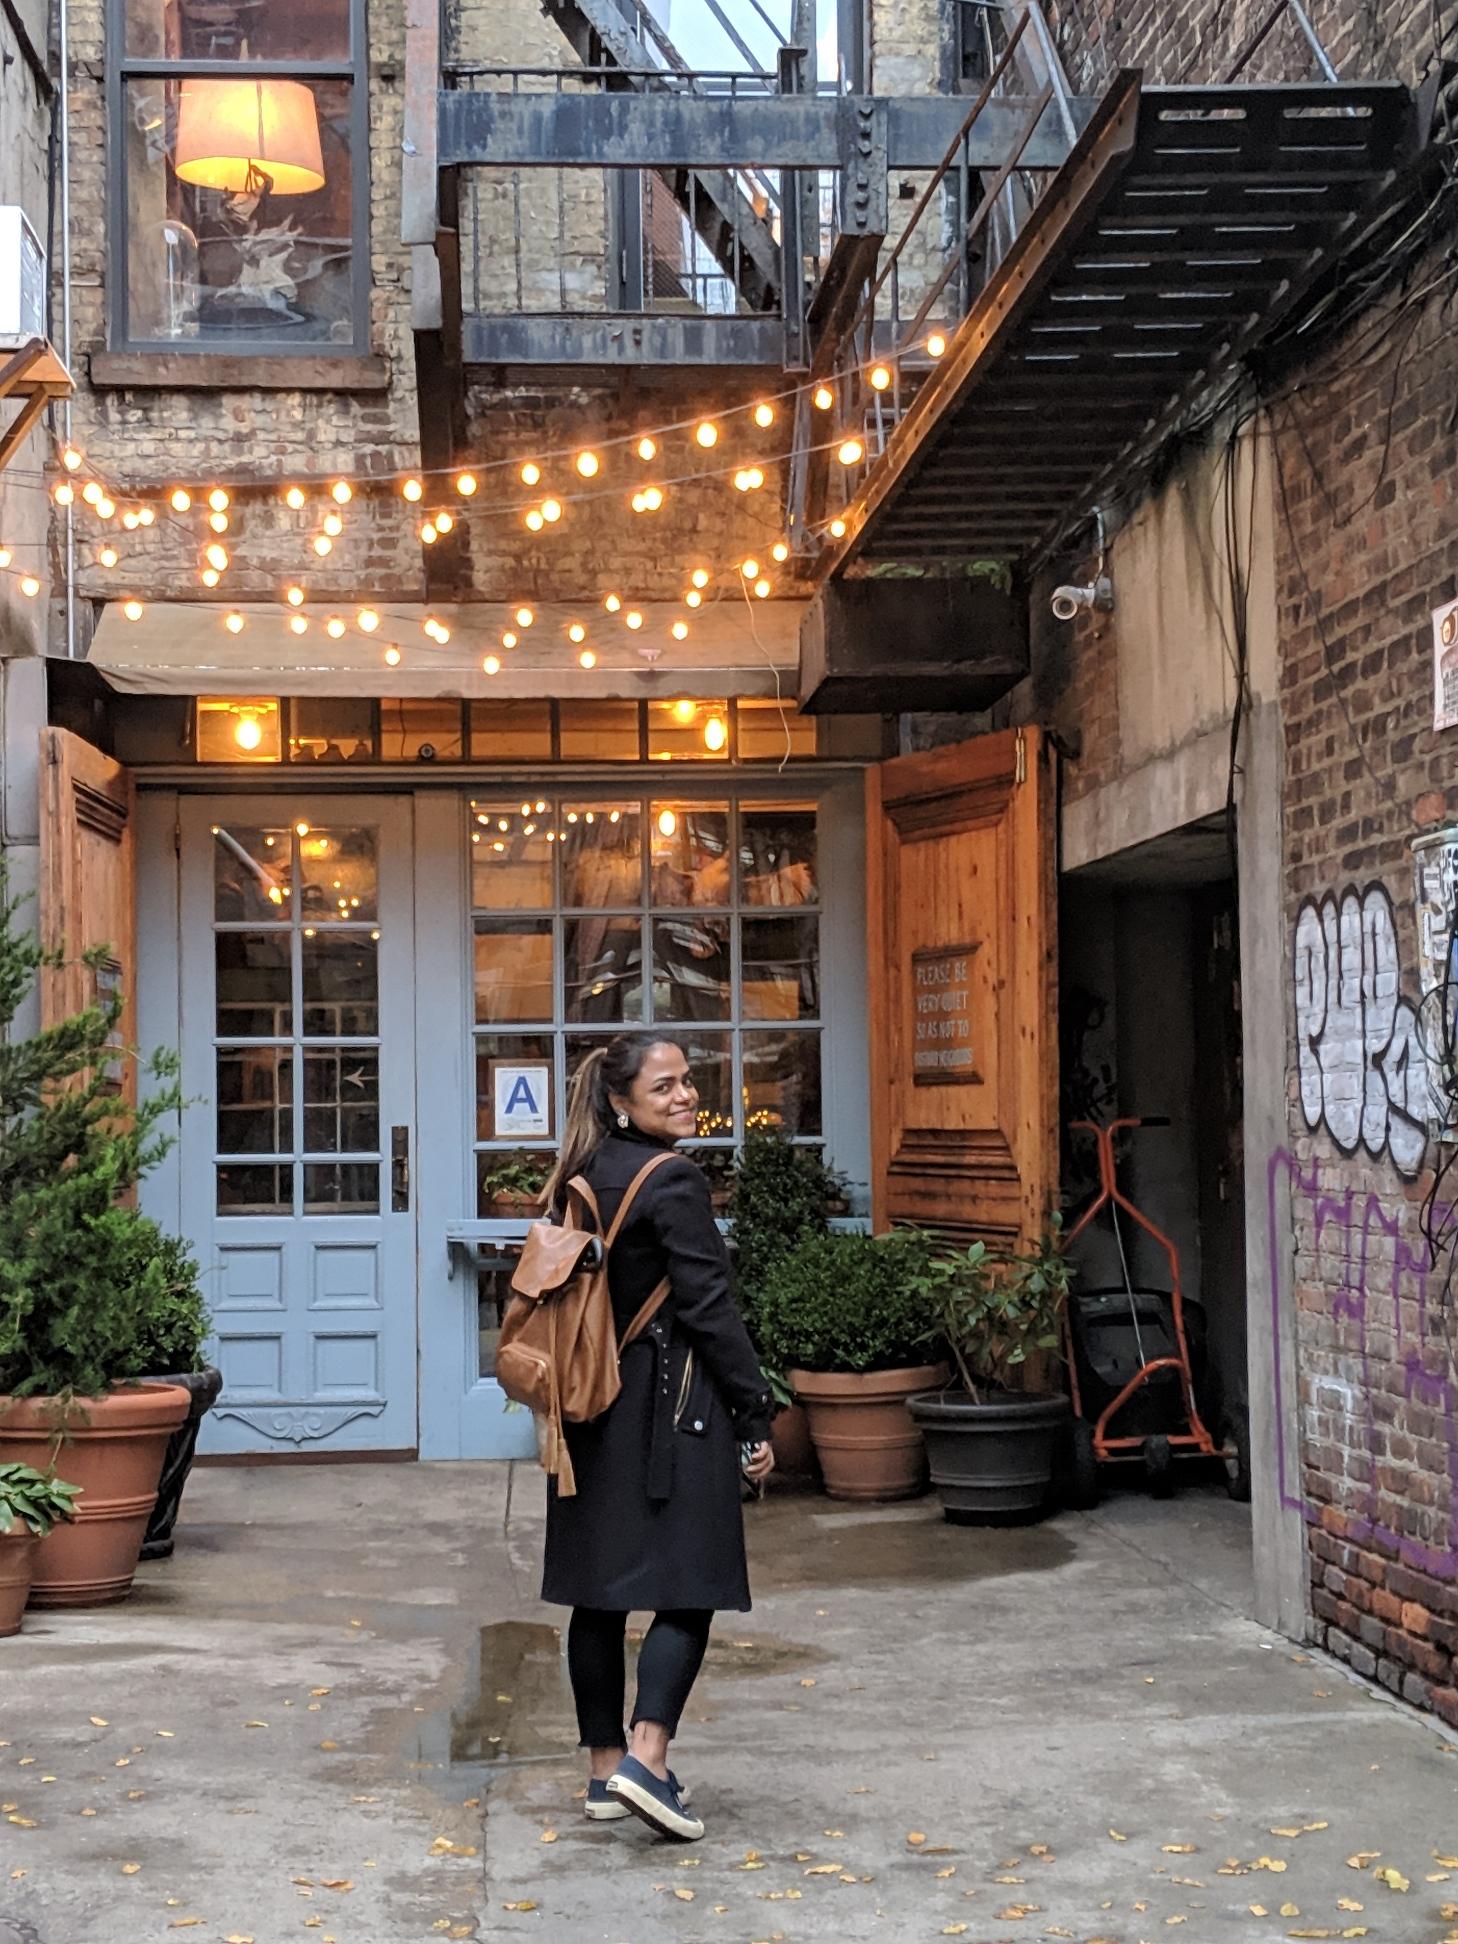 Sigrid exploring NYC for design inspiration